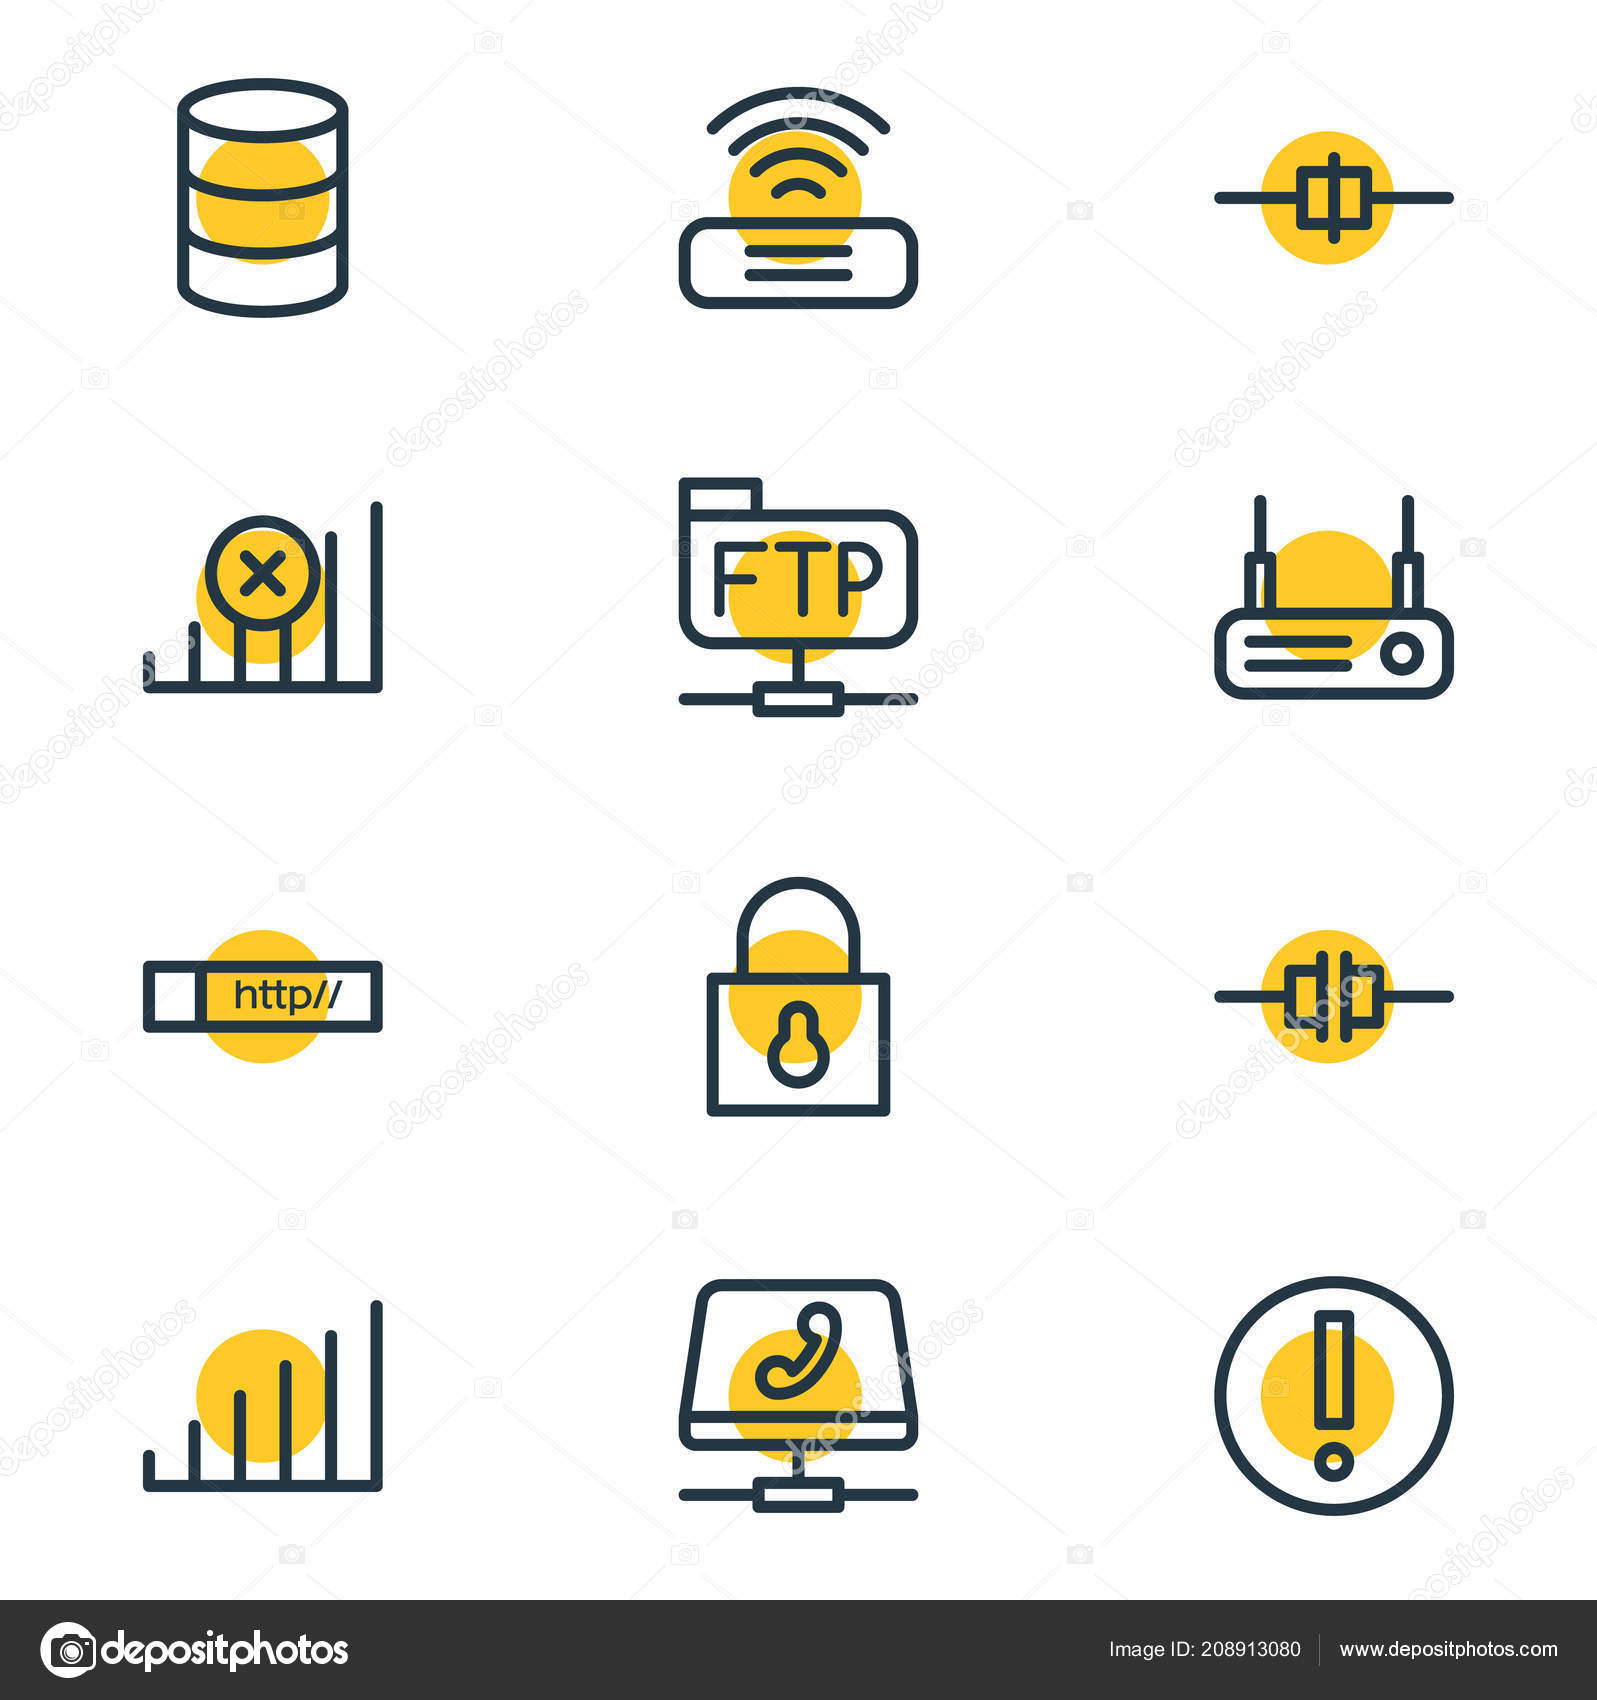 Illustration of 12 internet icons line style  Editable set